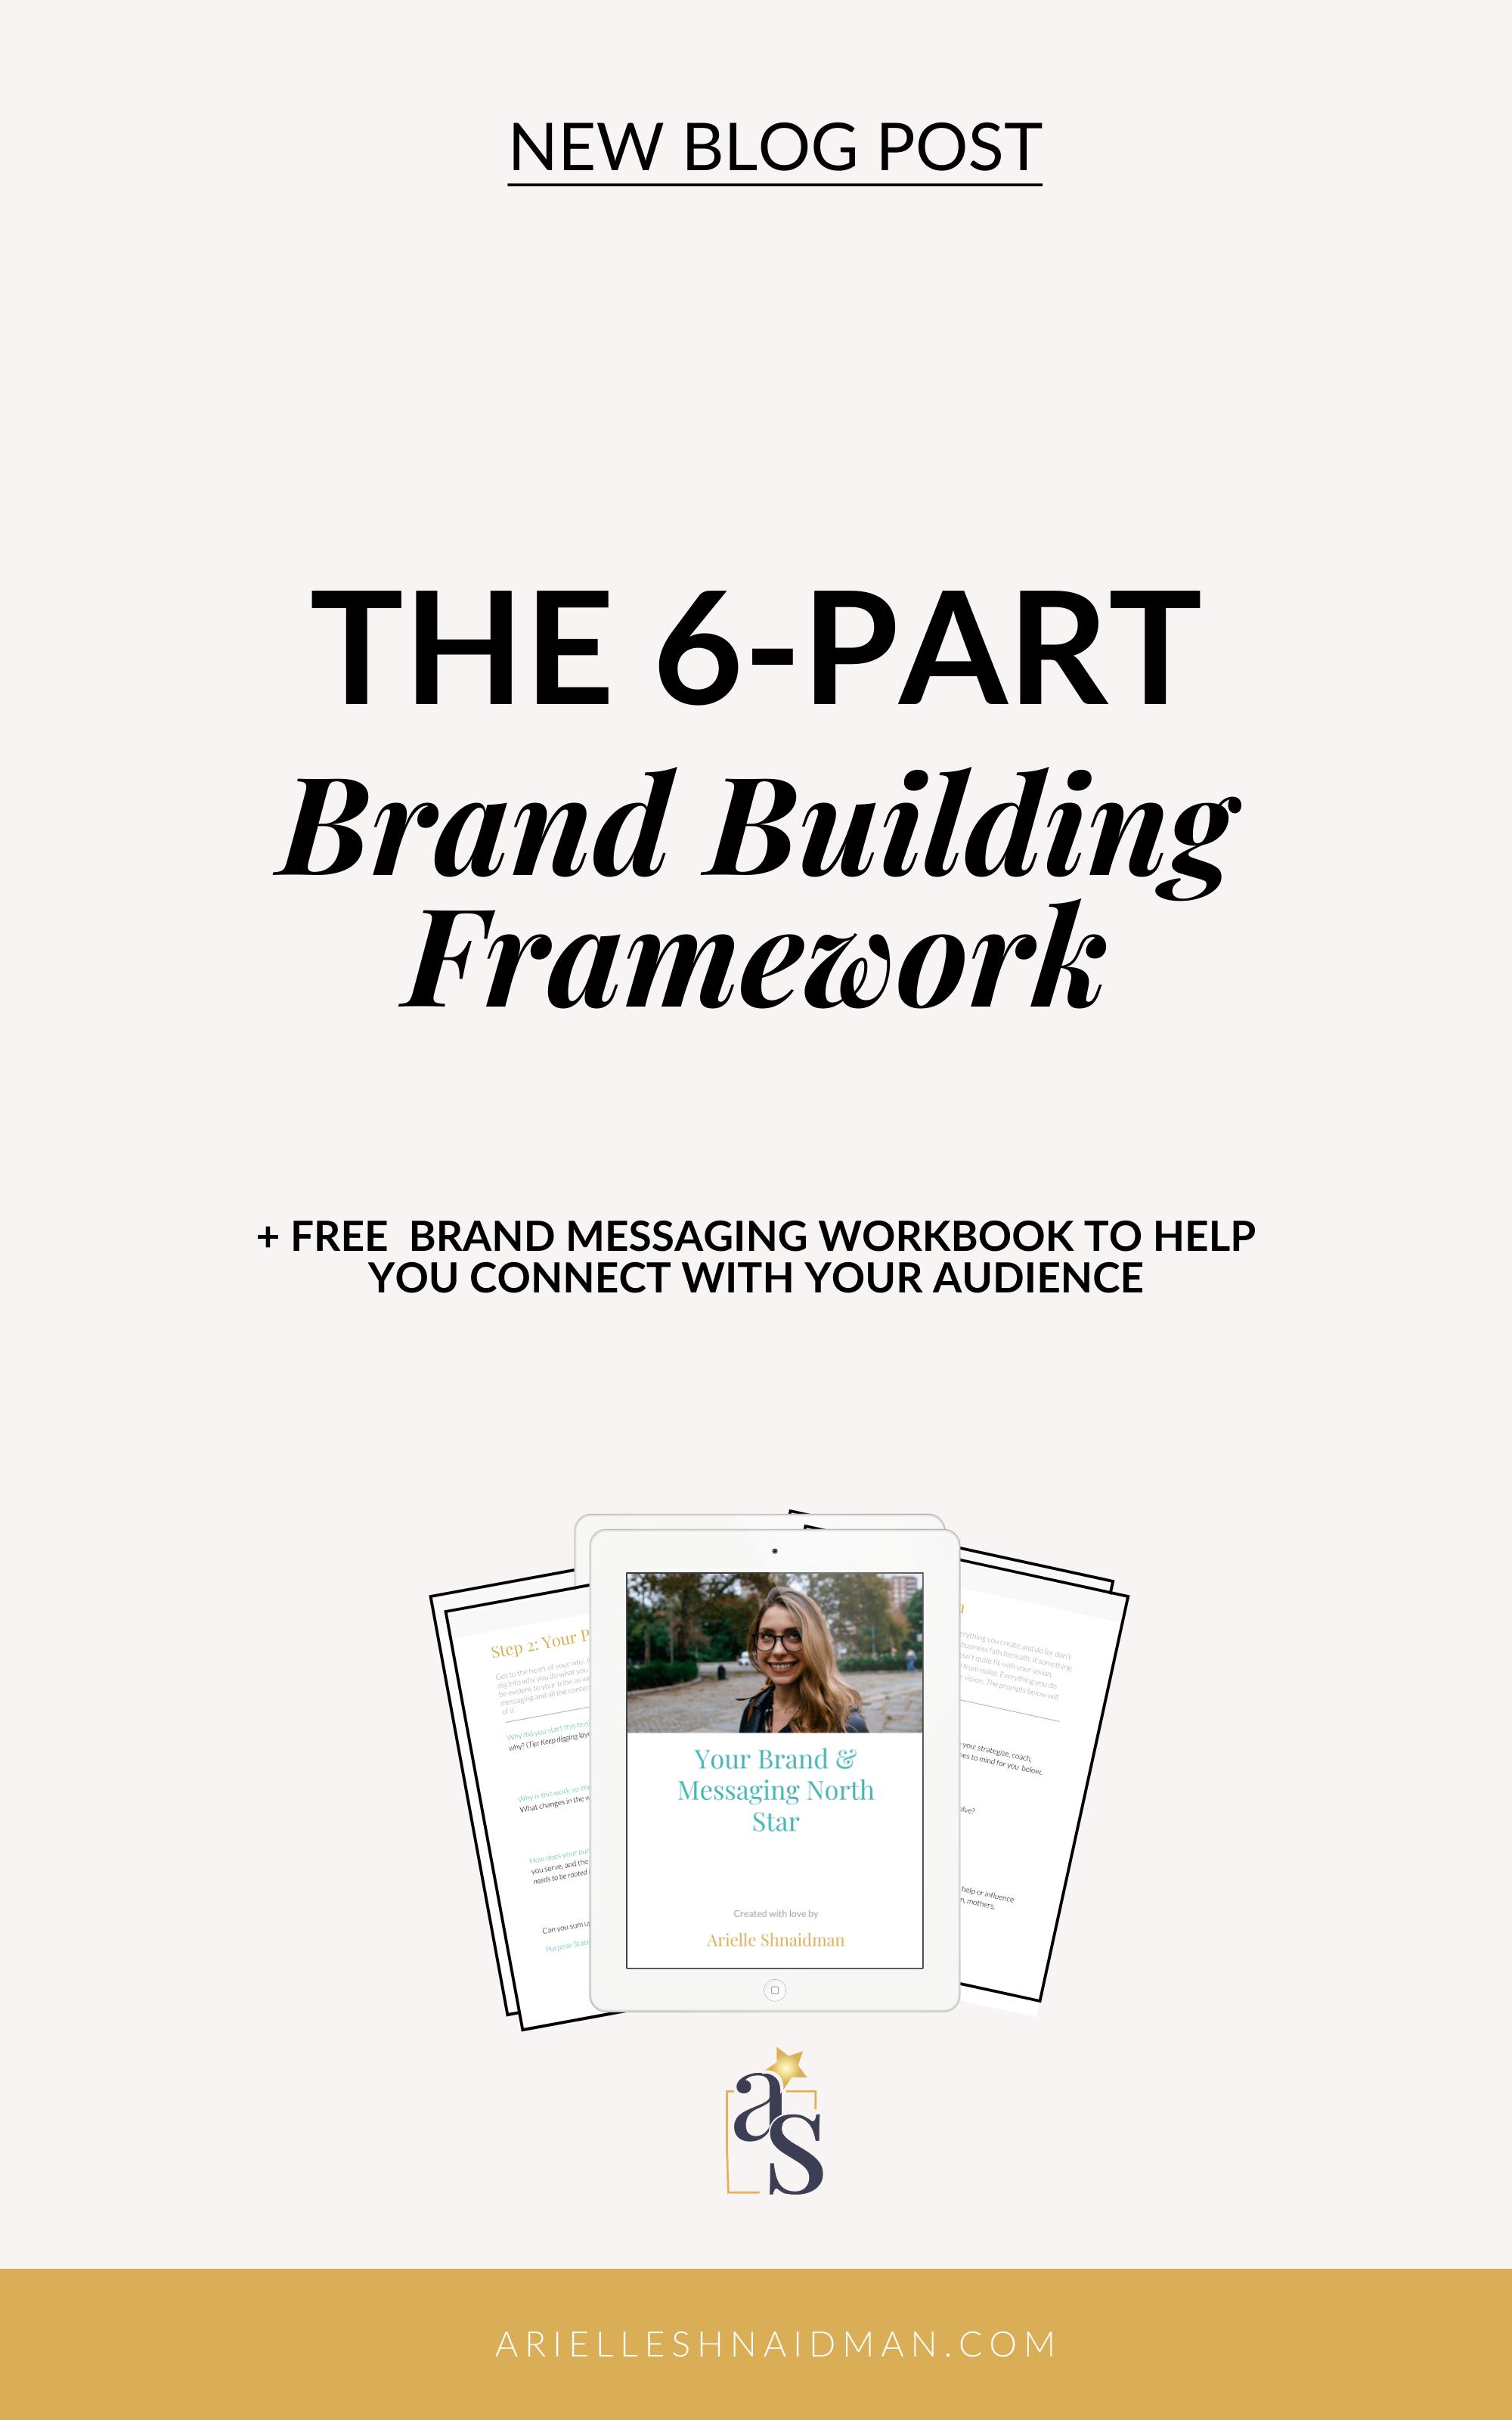 6part brand building framework + free brand messaging